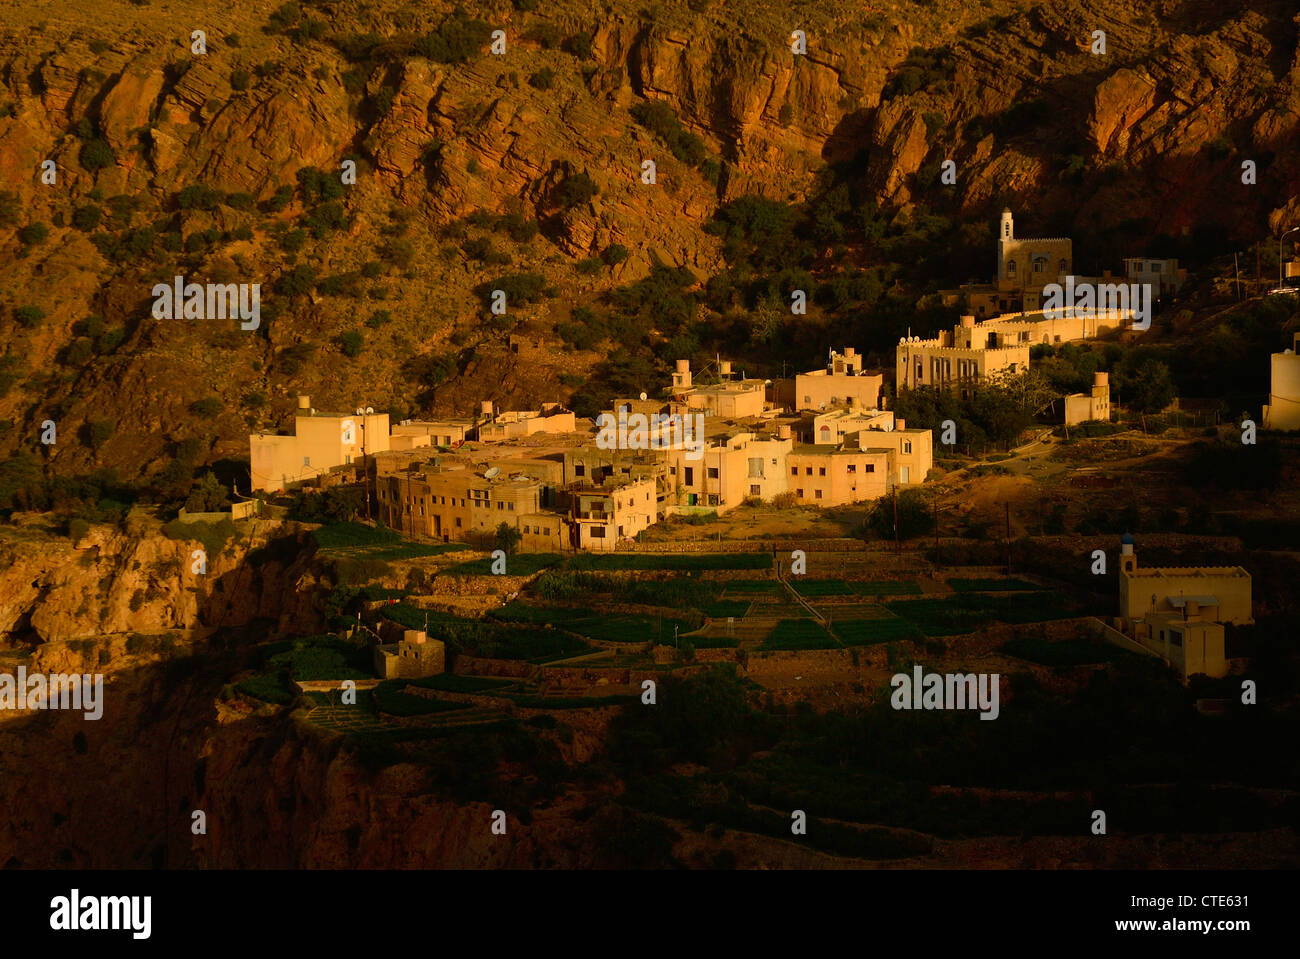 The village of Al Ayn, below the Sayq Plateau, Western Hajar Mountains, Oman - Stock Image